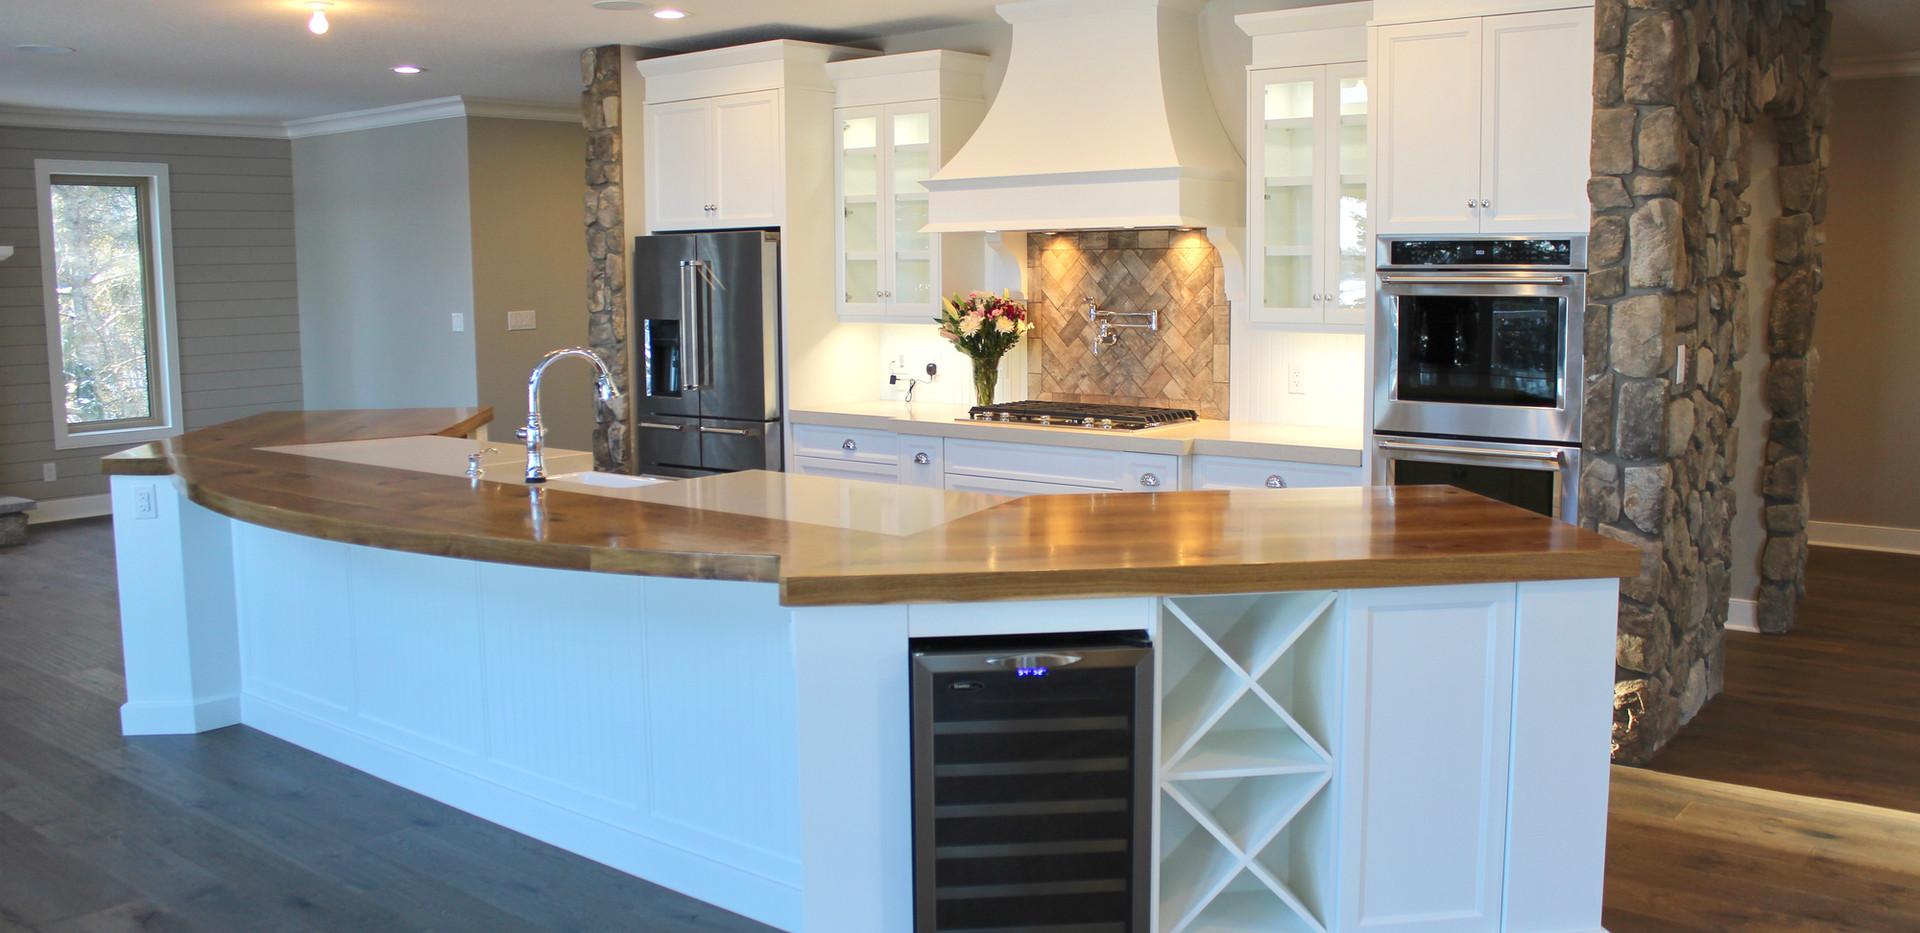 Solid Oak Countertops